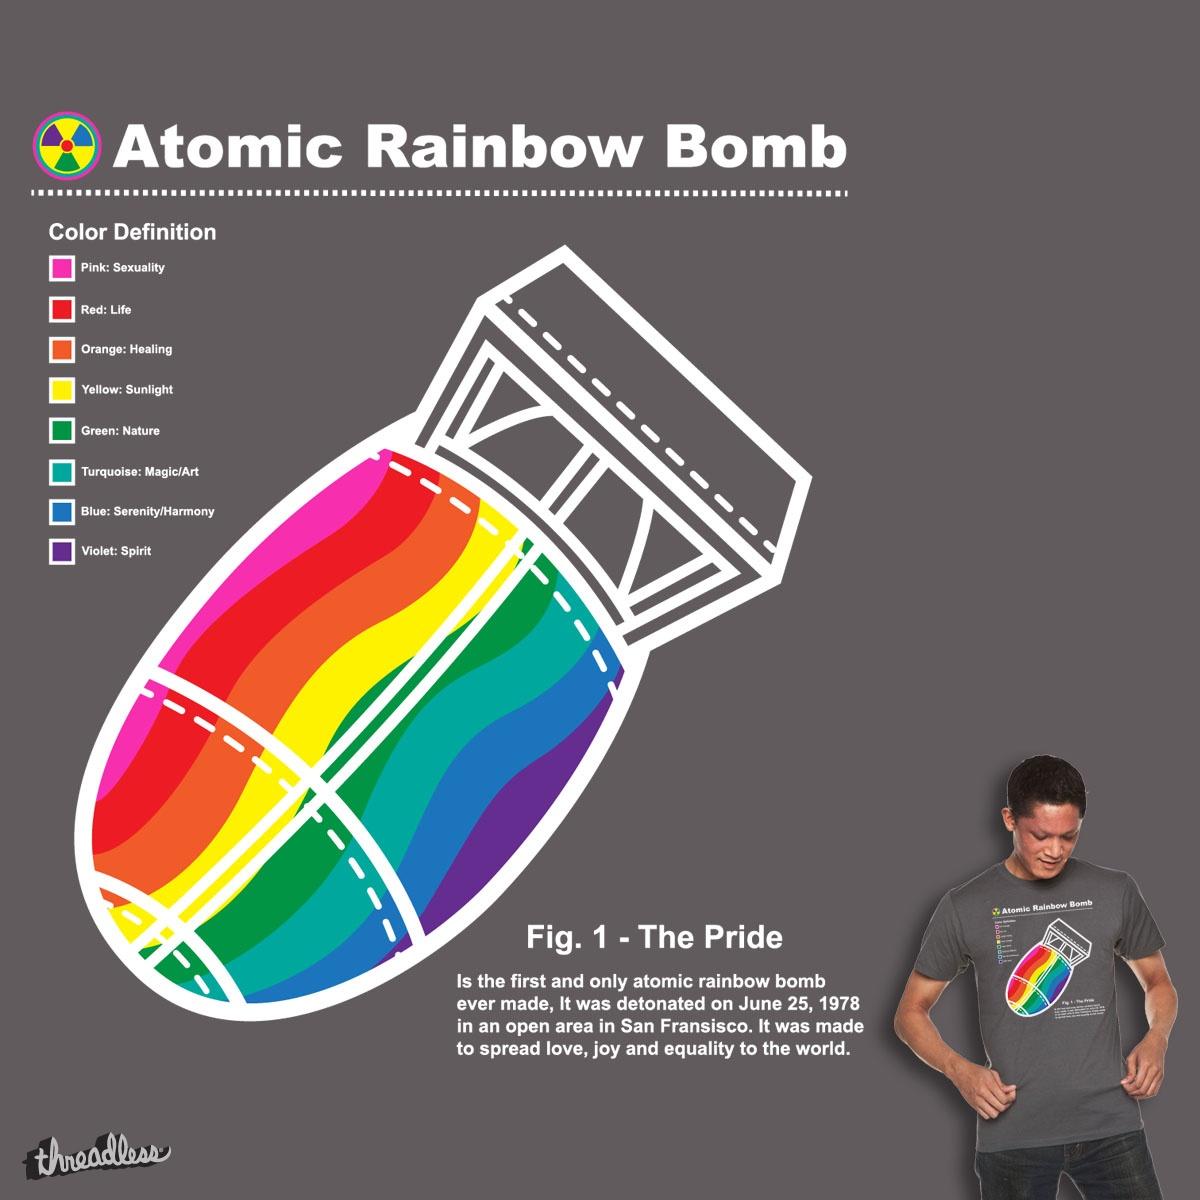 Atomic Rainbow Bomb by krisren28 on Threadless